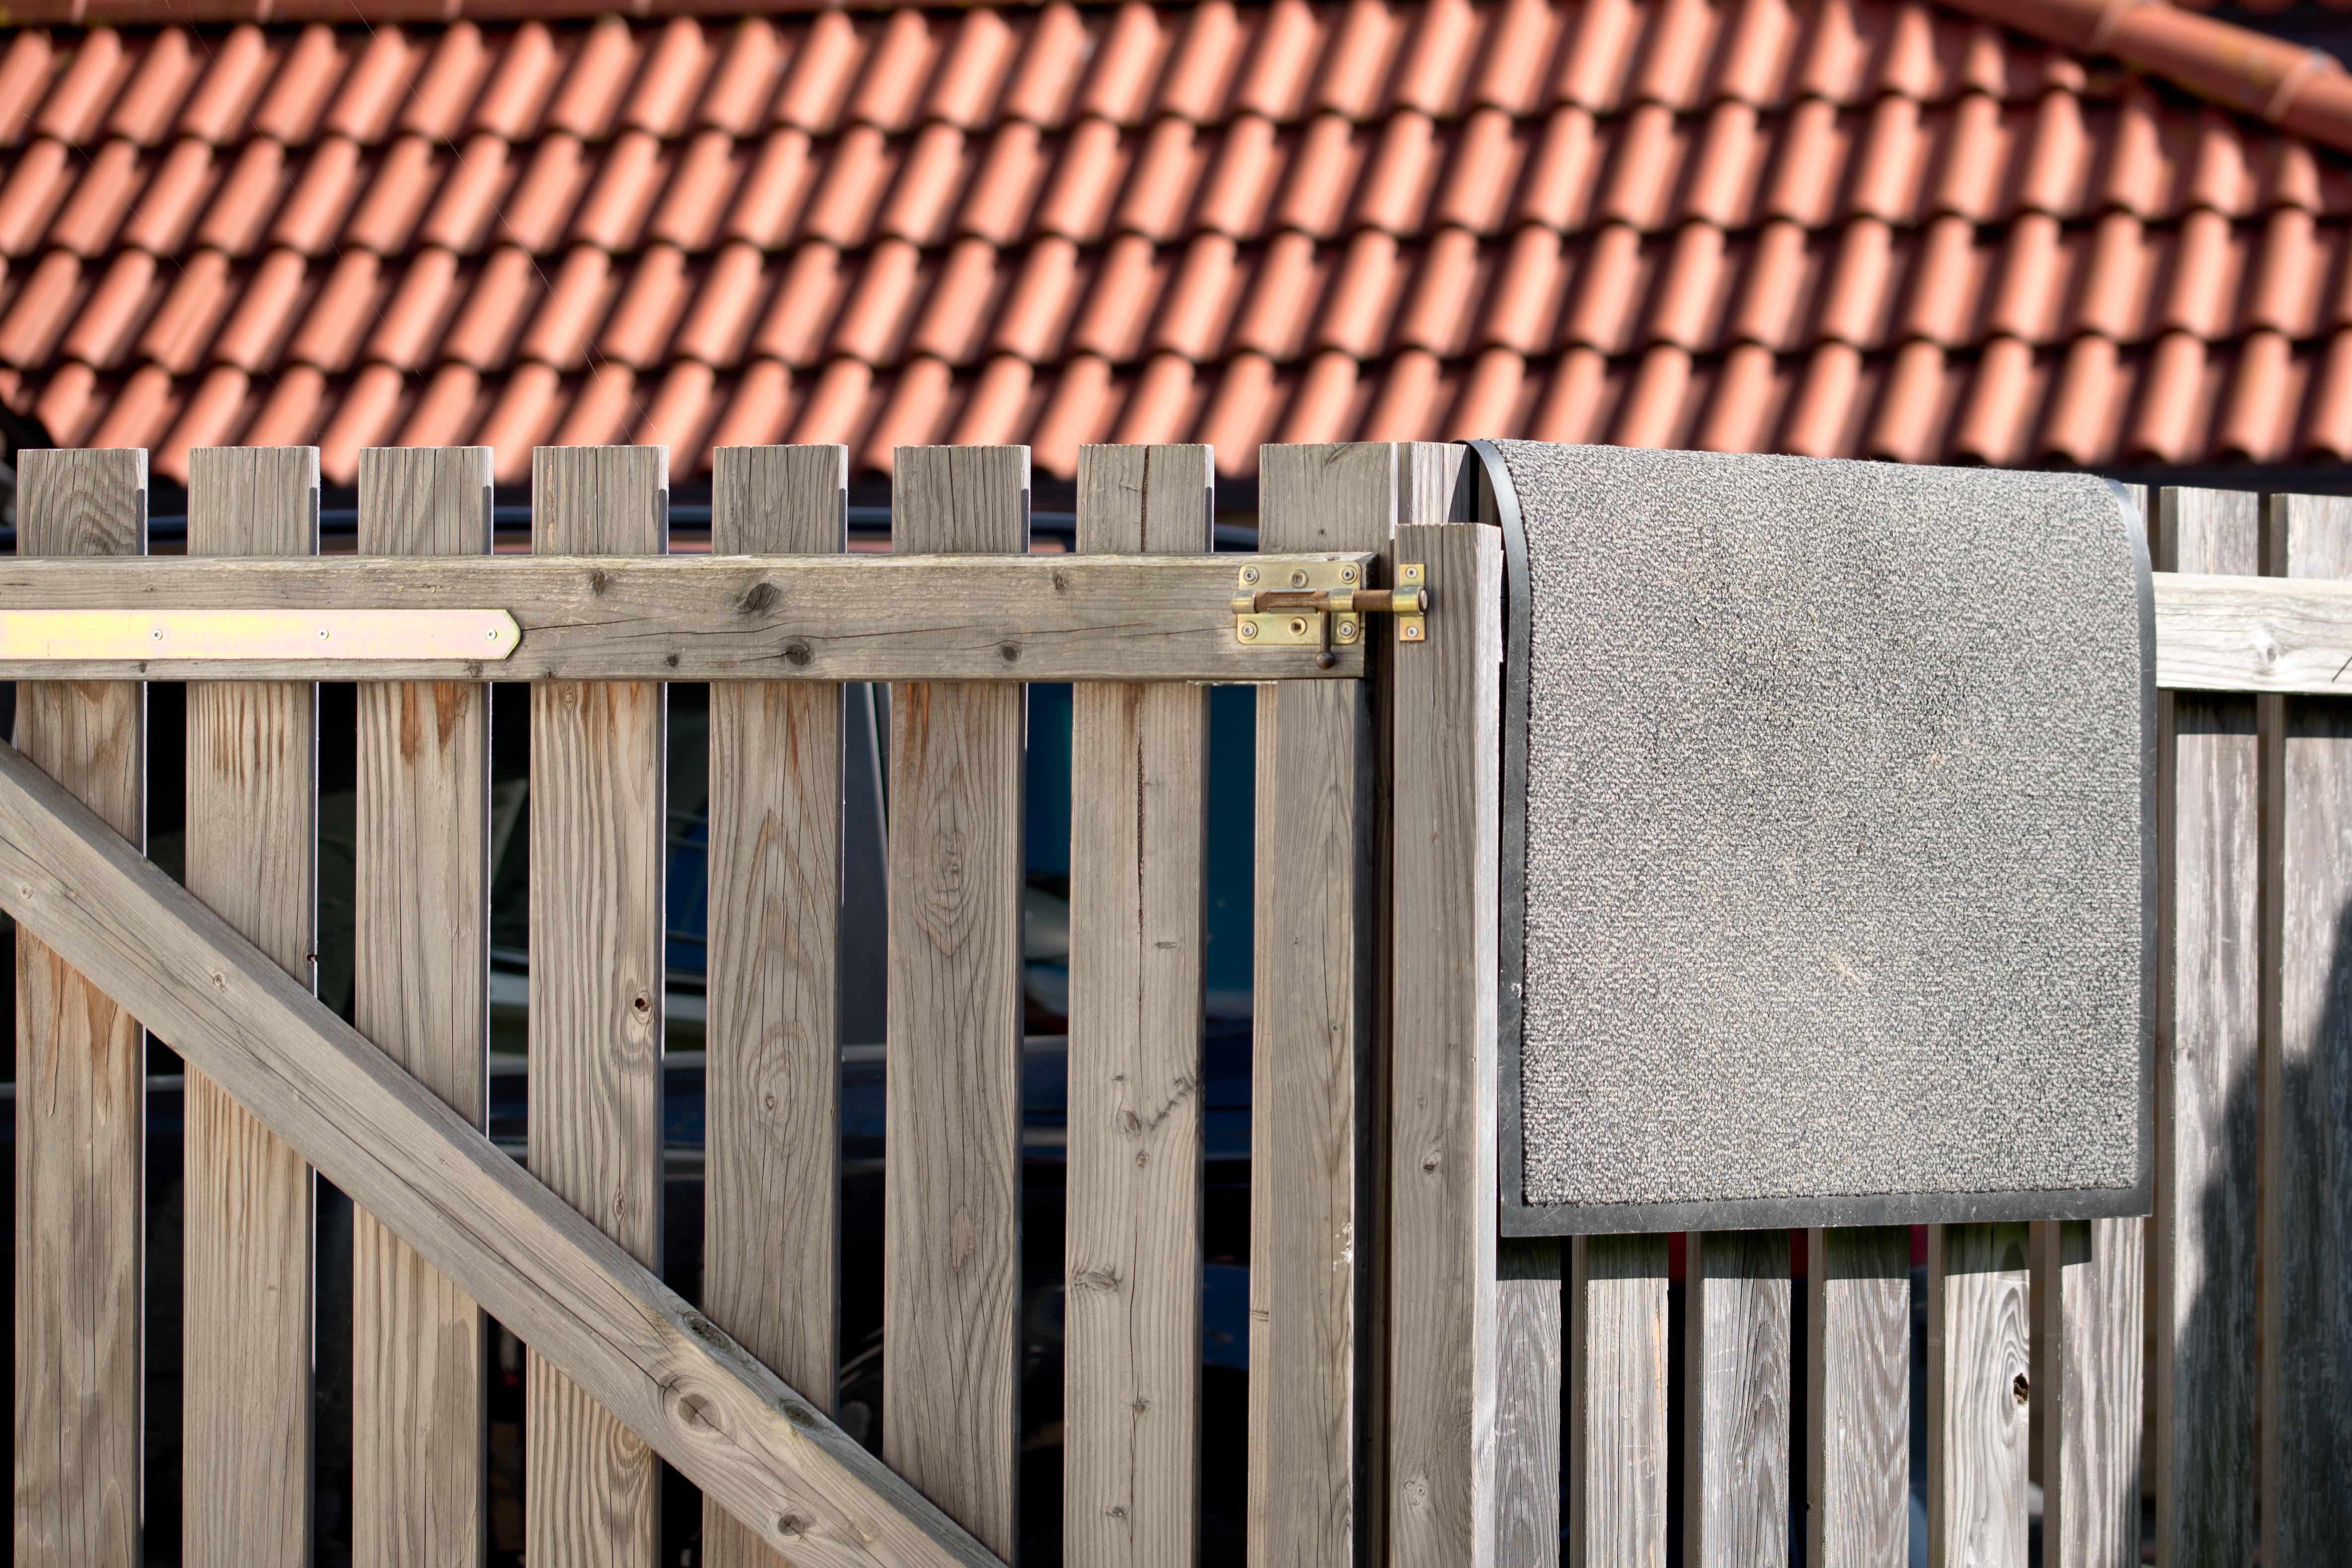 Kostenlose foto Zaun Holz Dach Zuhause Mauer Metall